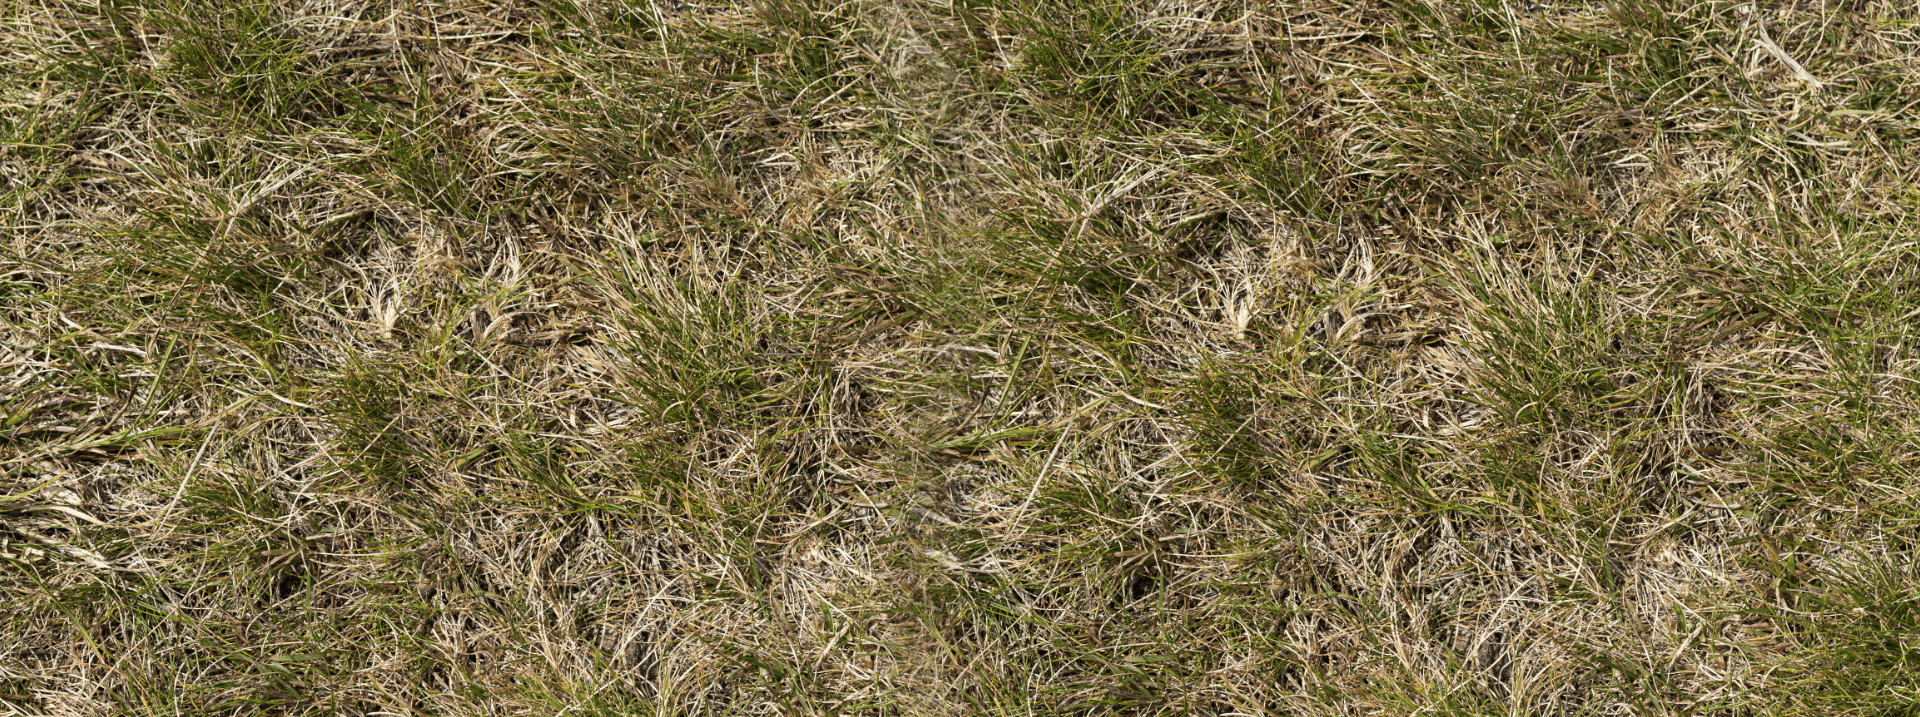 Bad grass 1